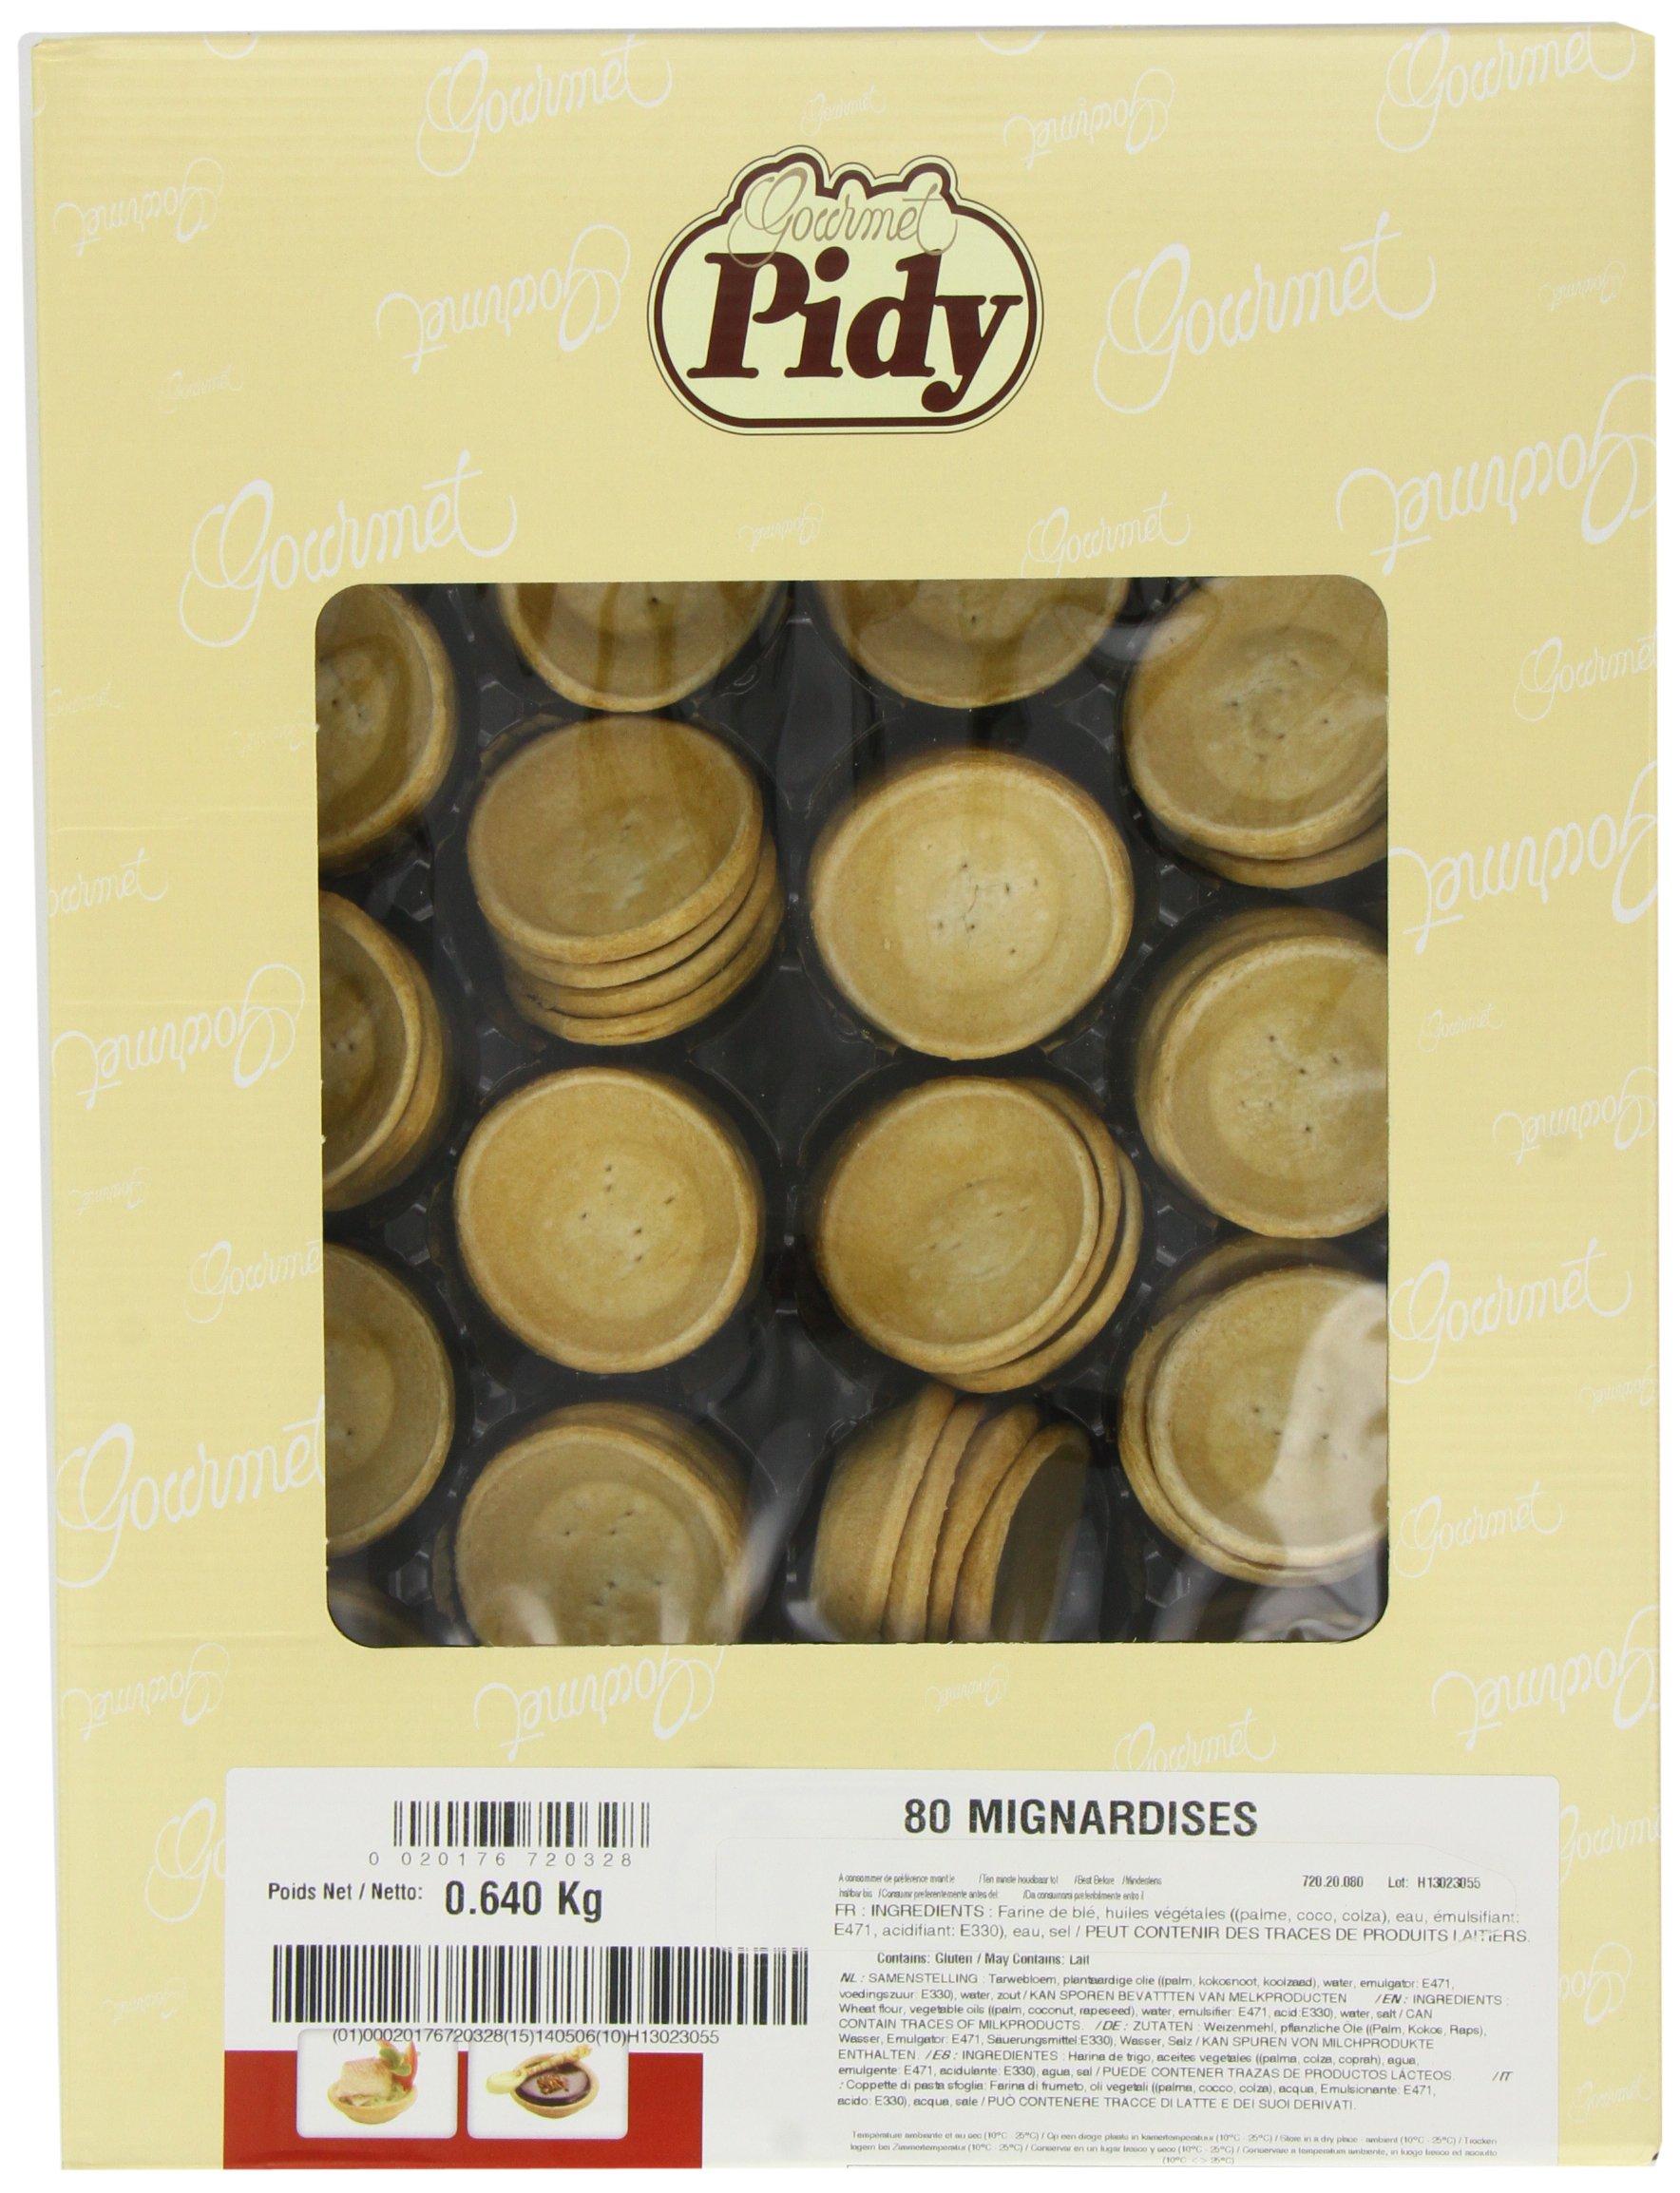 Pidy Mignardise Feuilletee Savoury Tartlet, 6 cm - 80 Portions